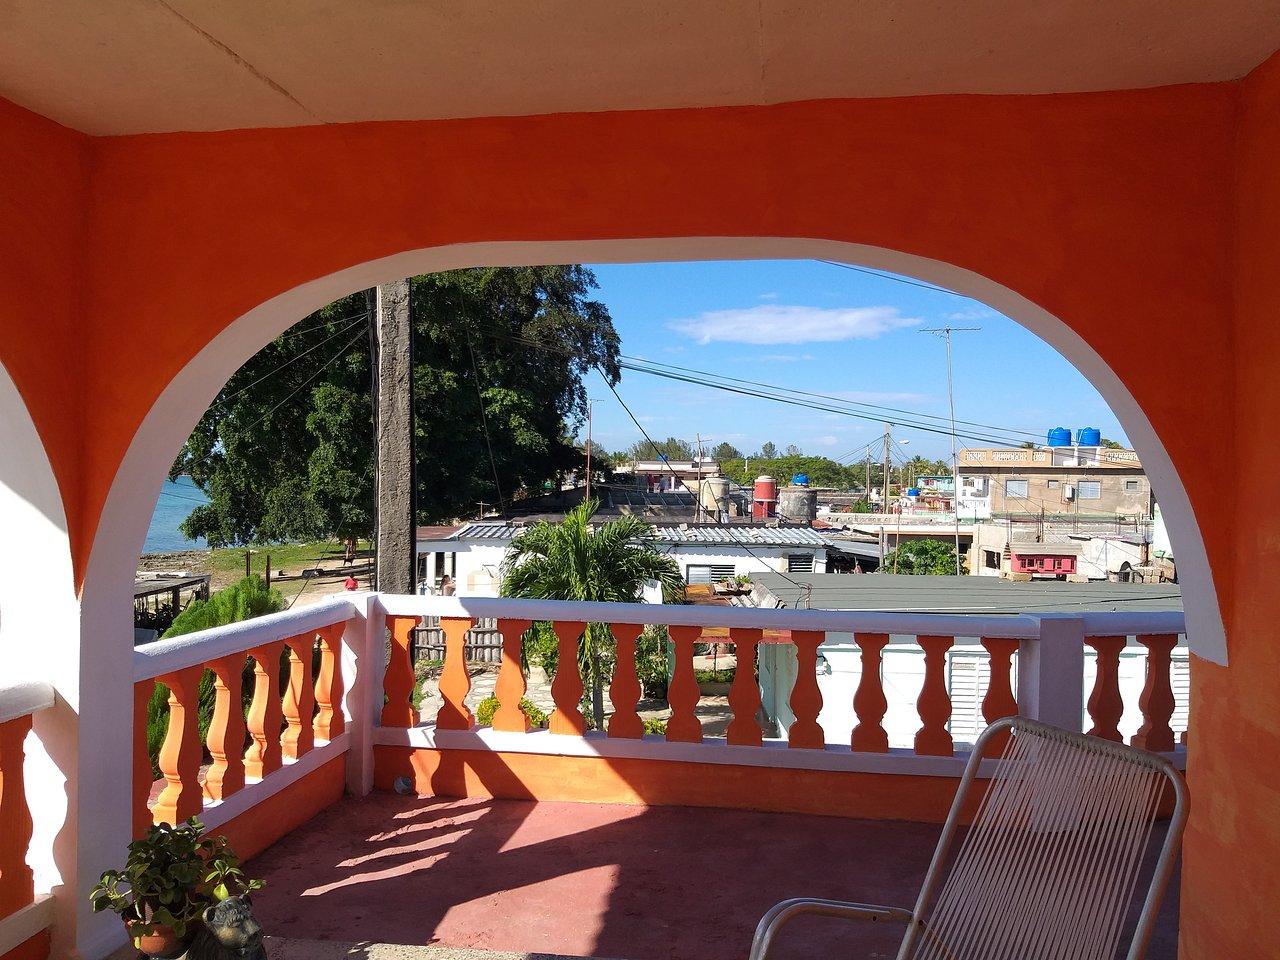 Casa Pelicano Jocaos Playa Larga Rooms Pictures Reviews